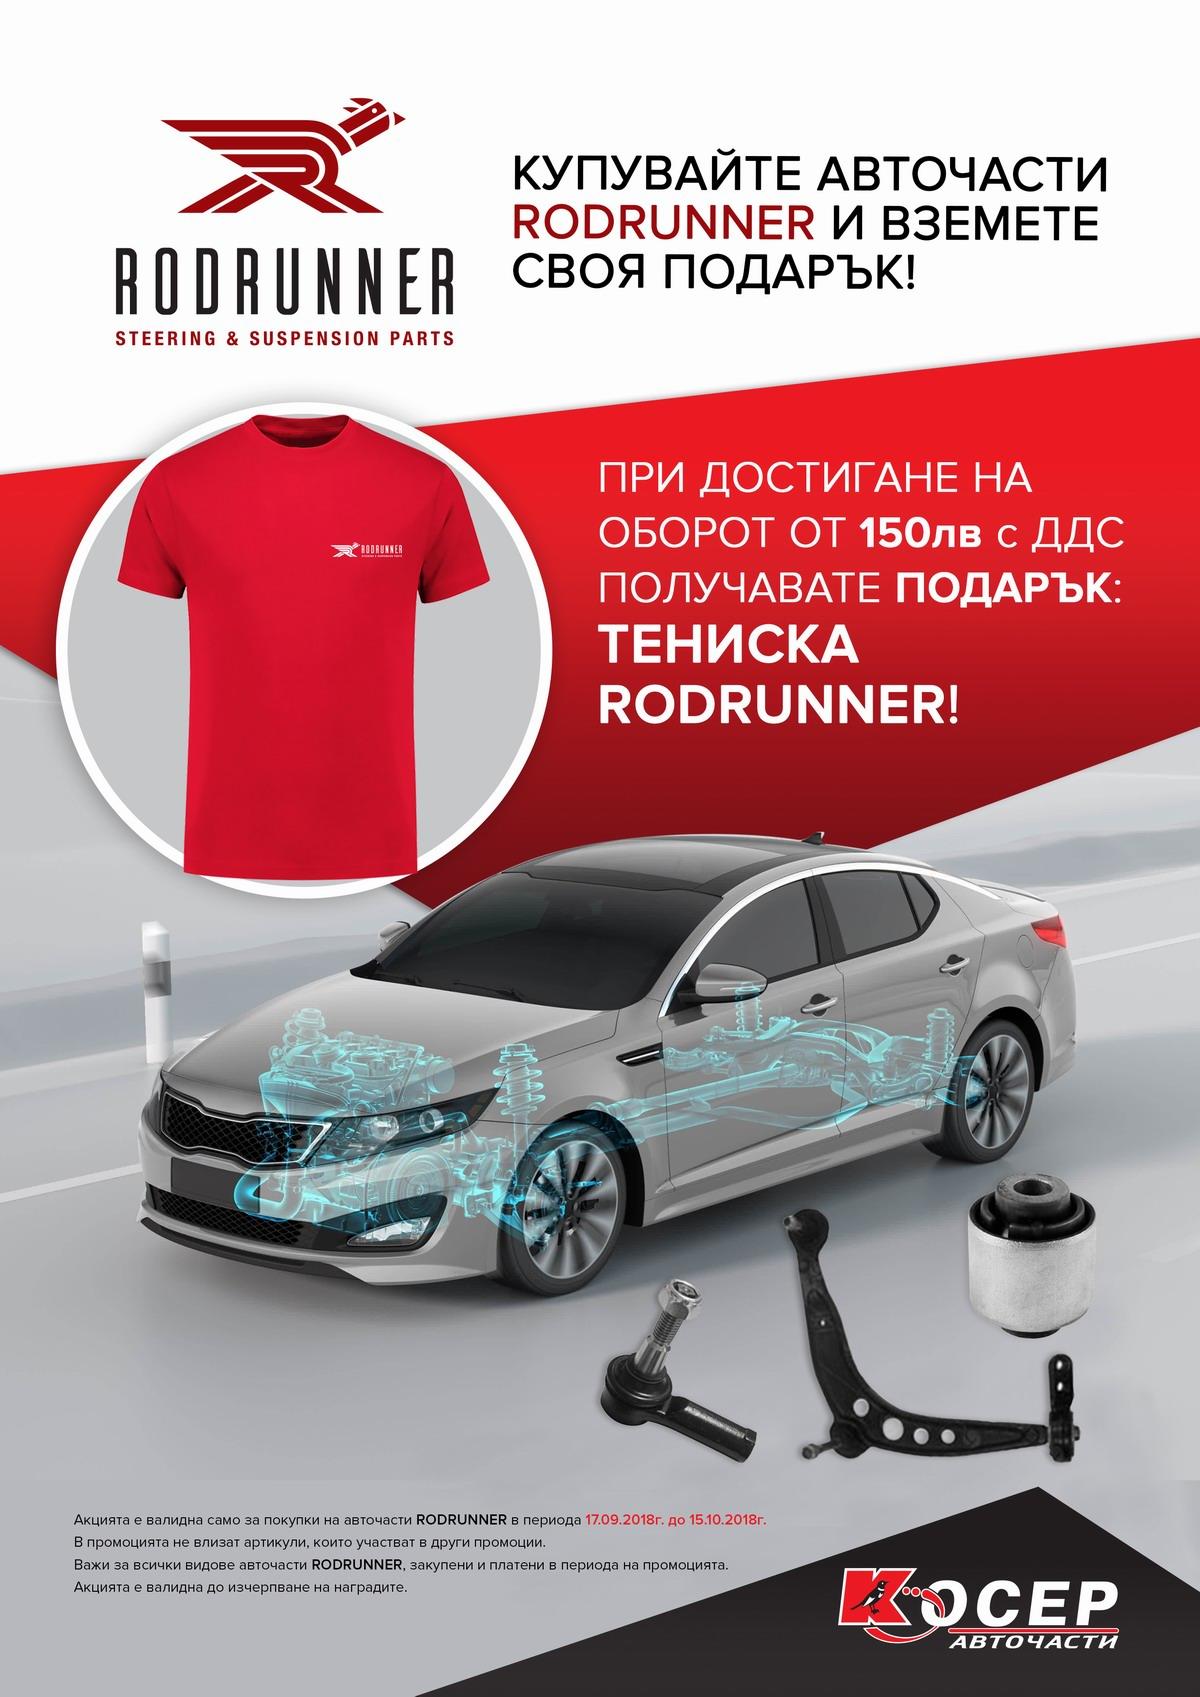 Промоция RODRUNNER - 17.09.2018 до 15.10.2018